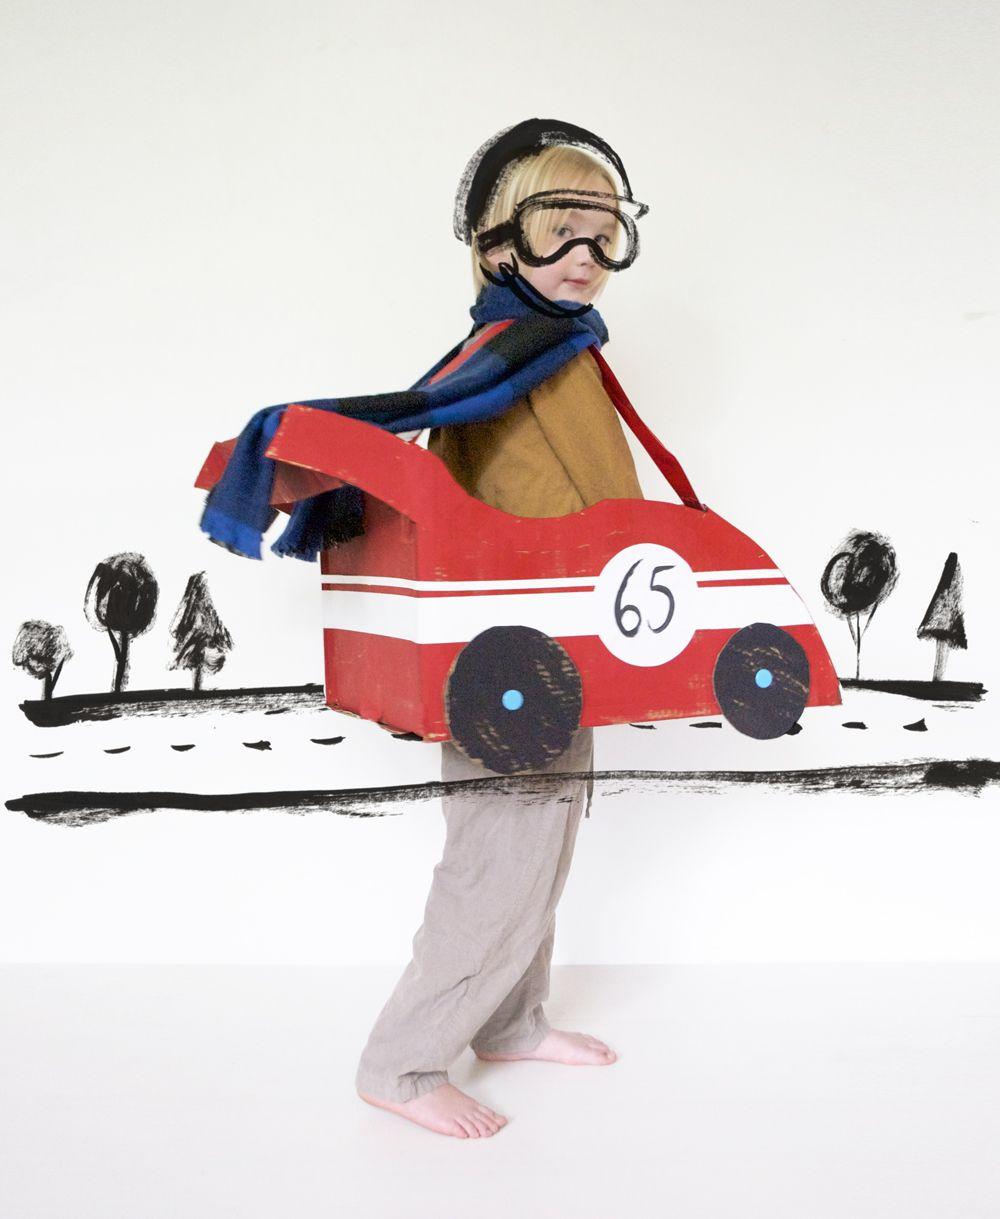 make your own cardboard car kids 21 instagram contest mermag